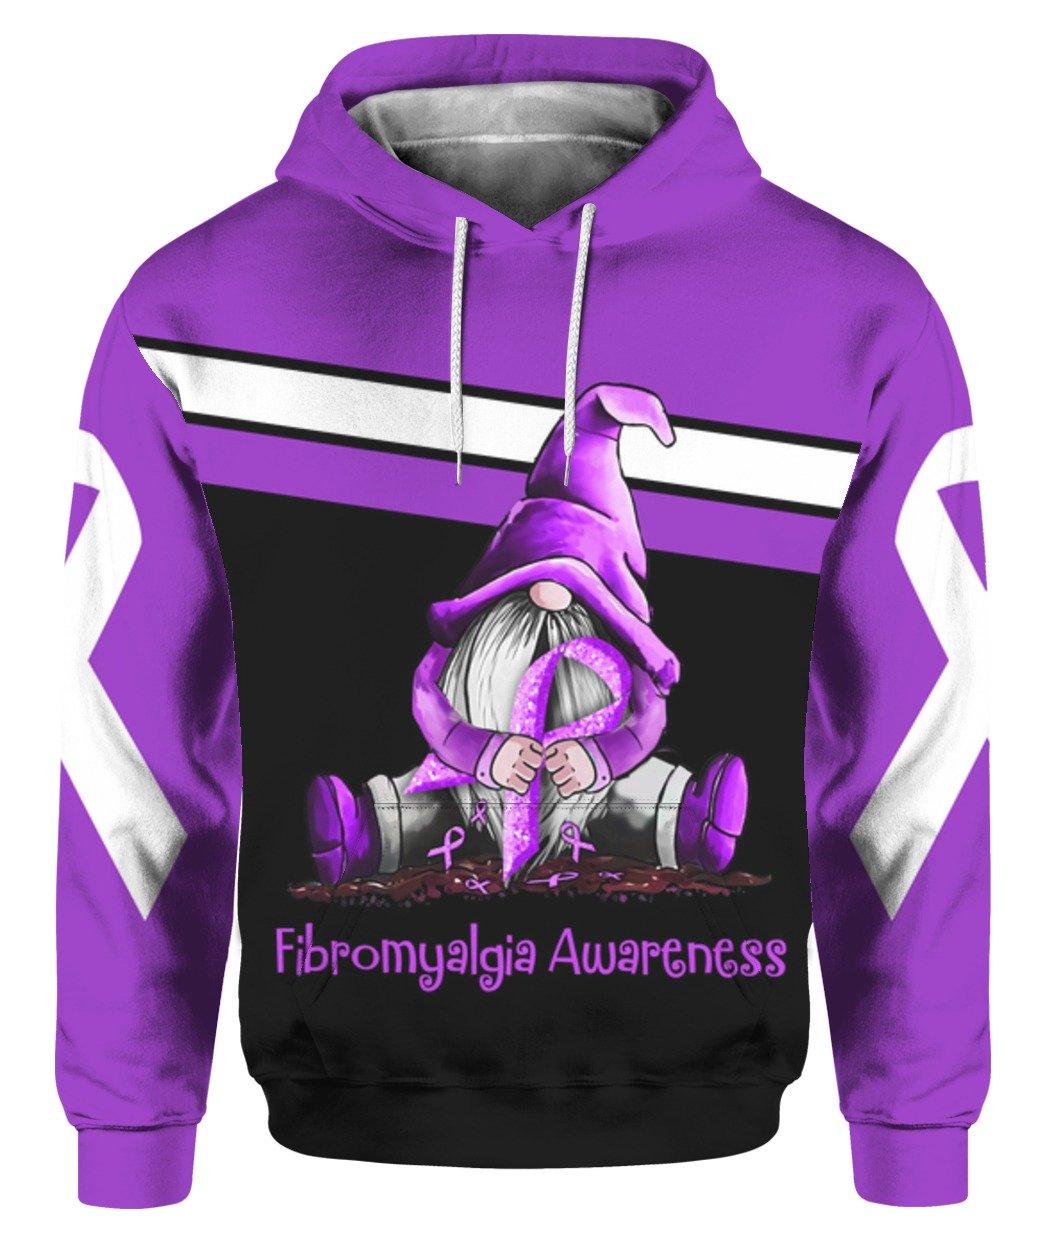 Gnome fibromyalgia awareness full printing hoodie